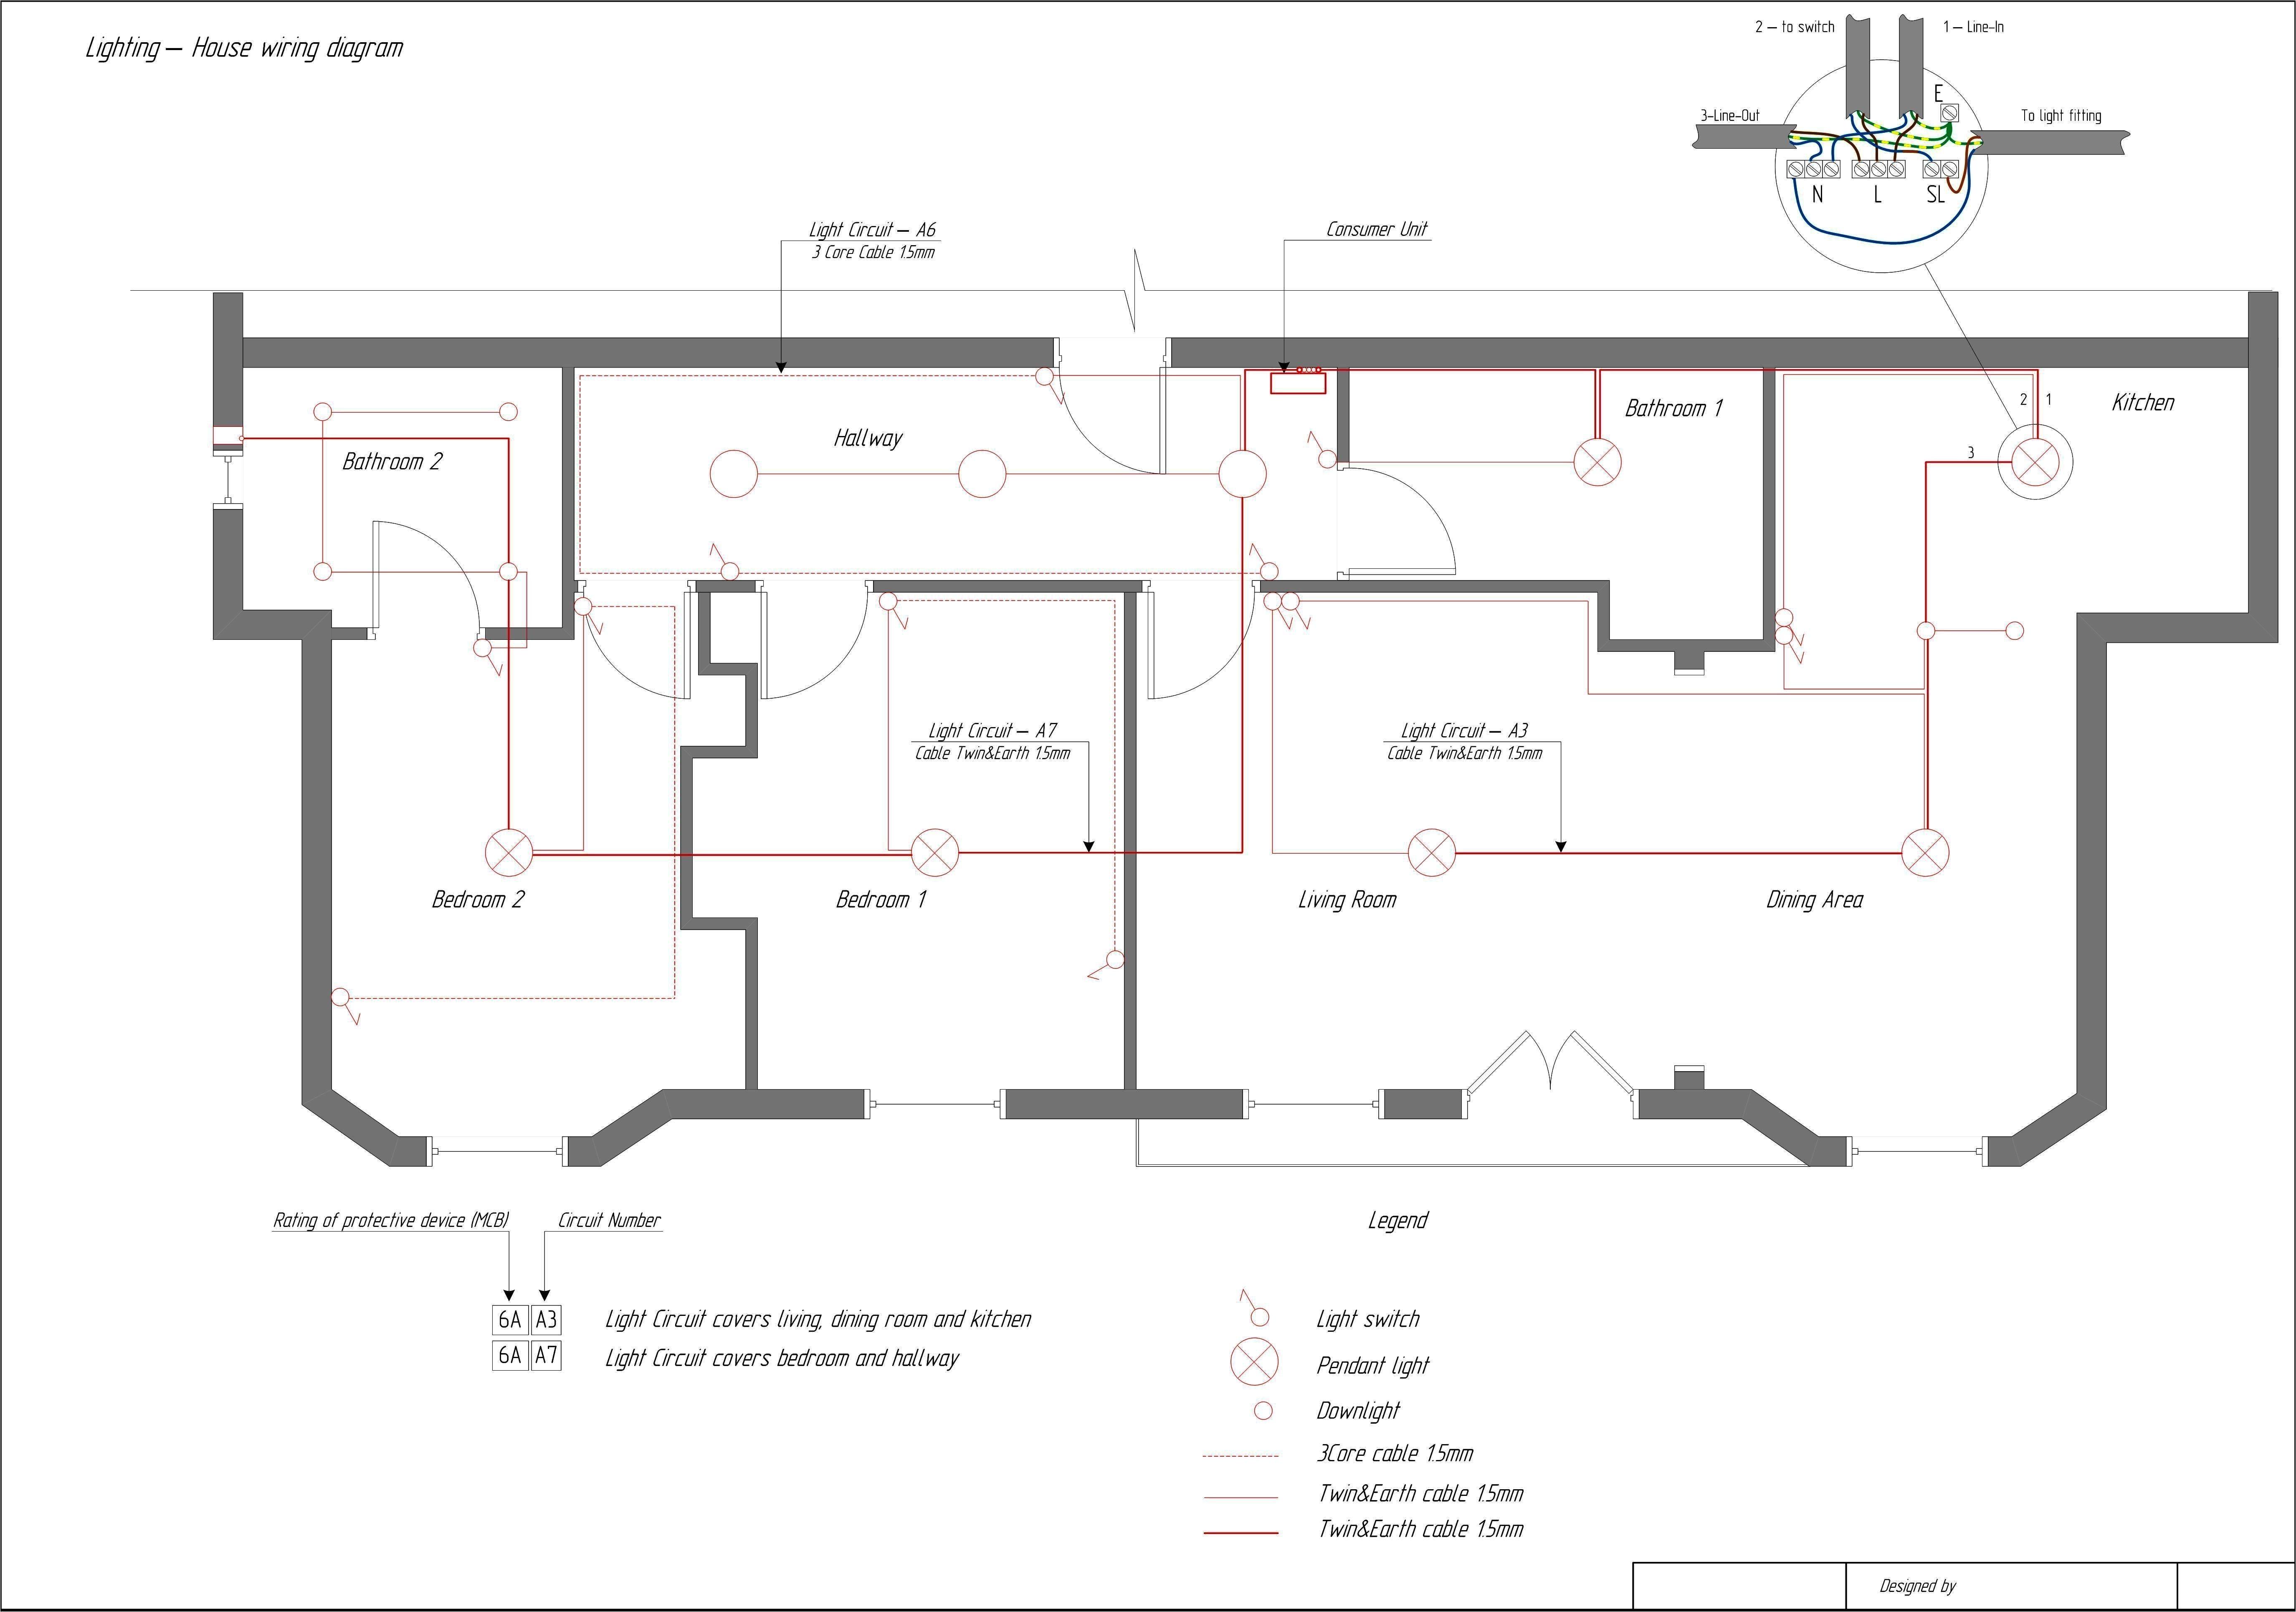 wiring diagram layout wiring diagram technic home wiring layout diagram home wiring layout database wiring diagramhouse